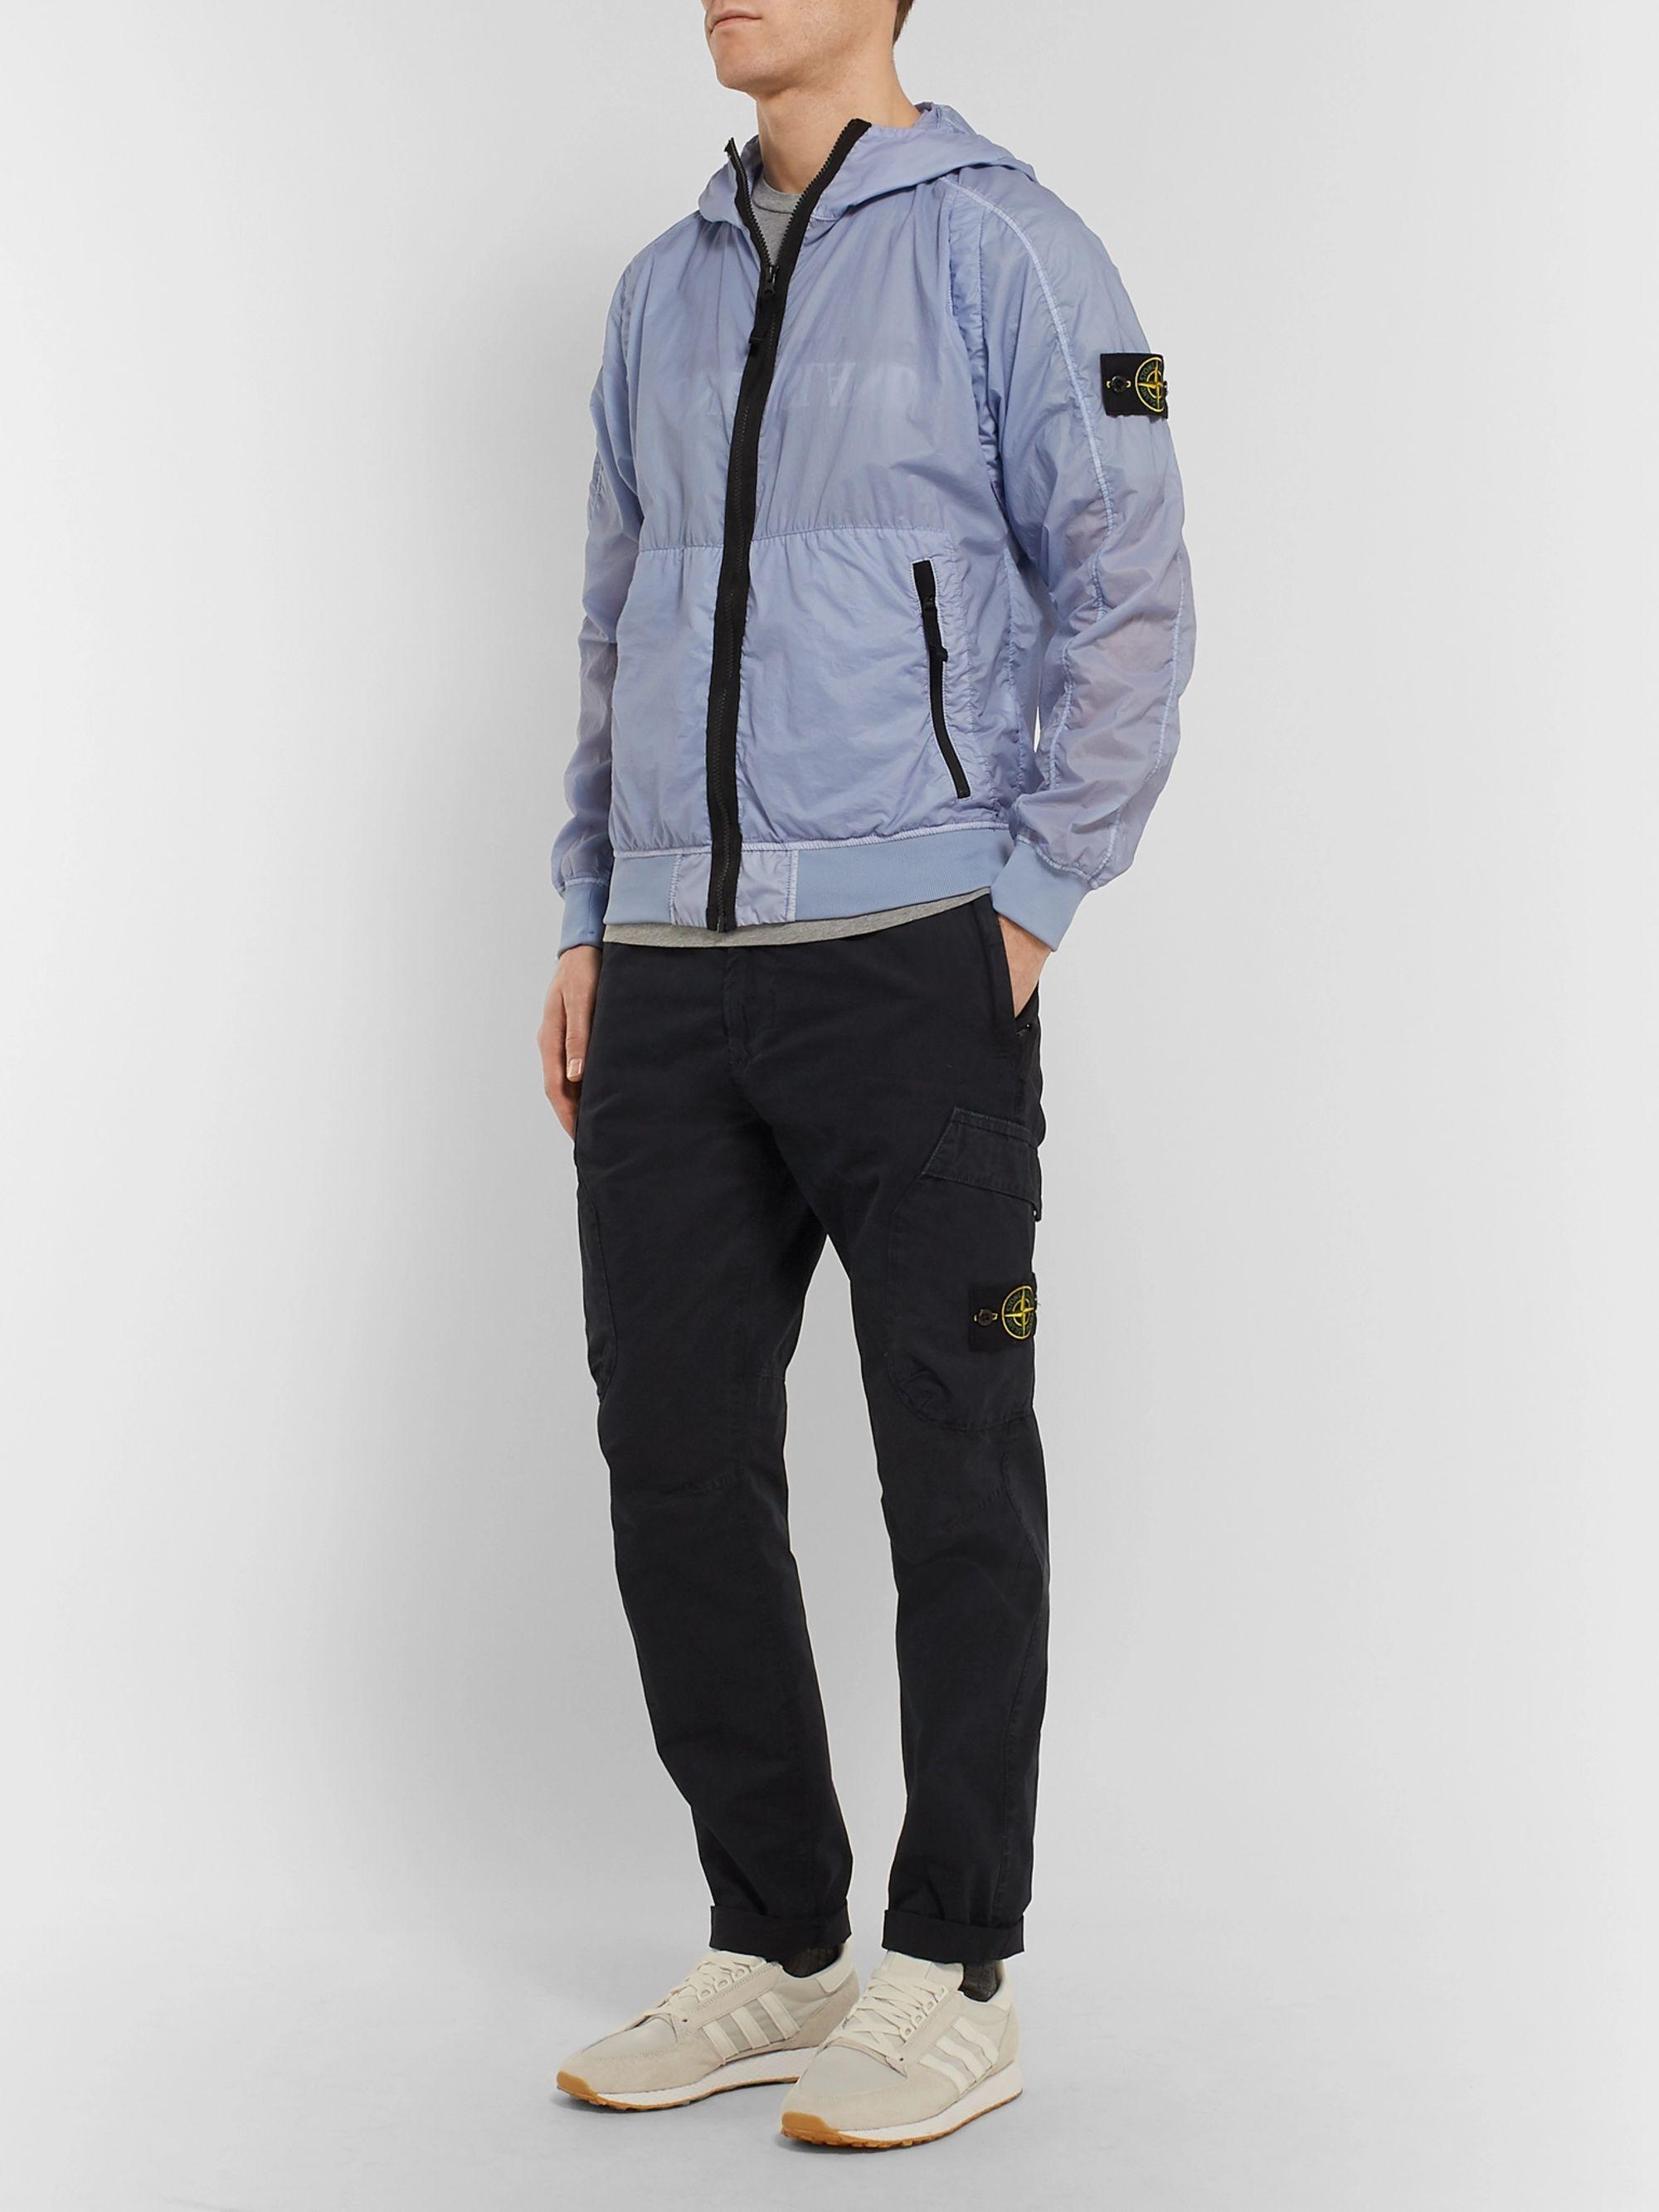 Logo-Appliquéd Garment-Dyed Shell Hooded Jacket